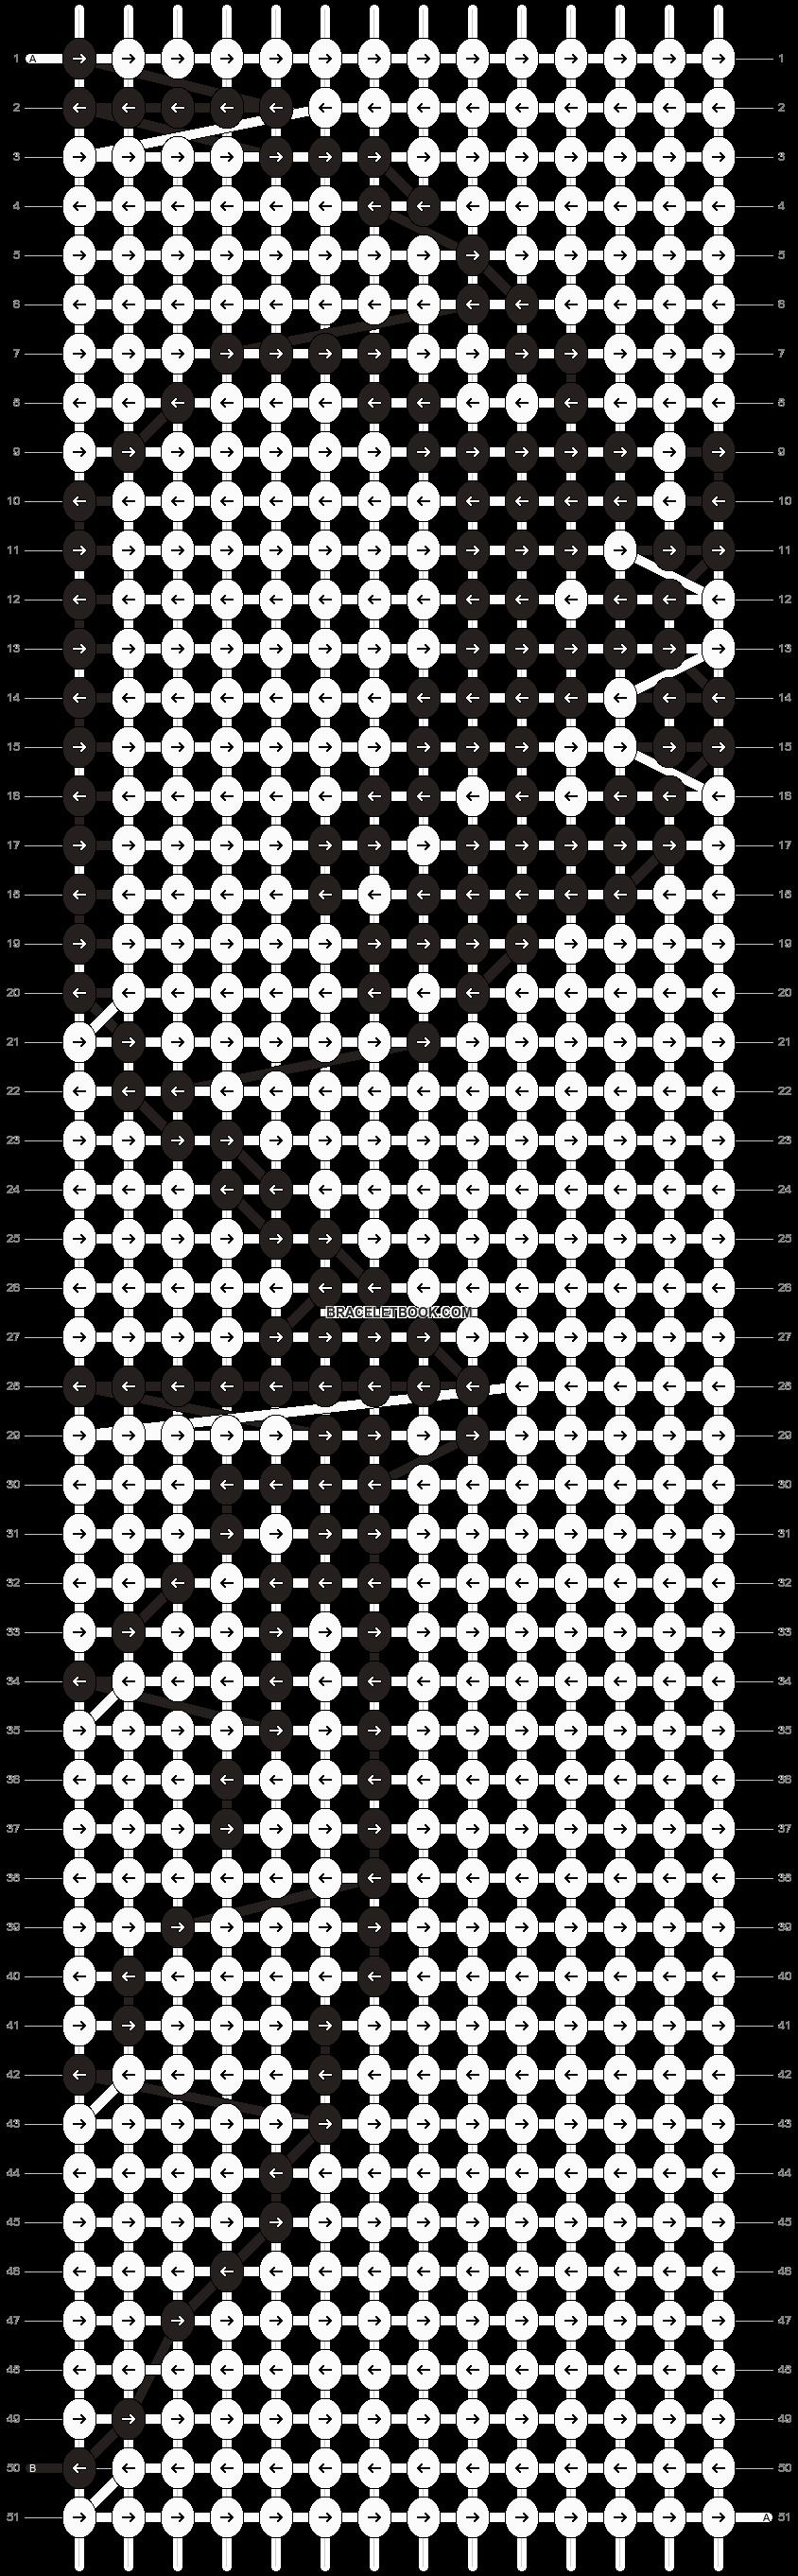 Alpha pattern #11827 pattern